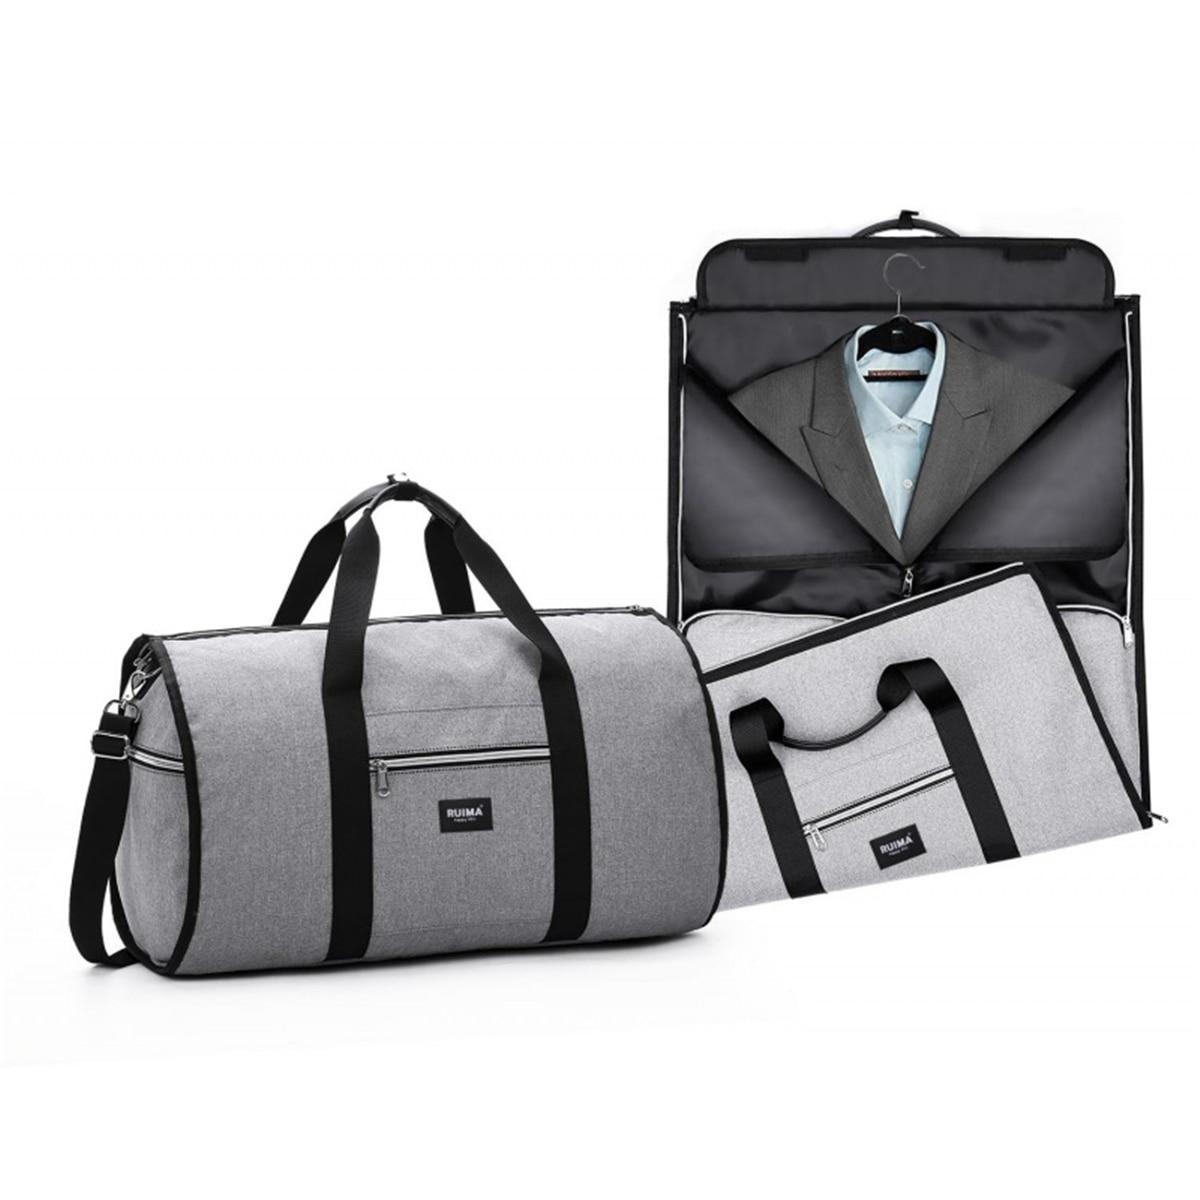 Travel Luggage Duffle Bag Lightweight Portable Handbag Engineer Never Wrong Large Capacity Waterproof Foldable Storage Tote